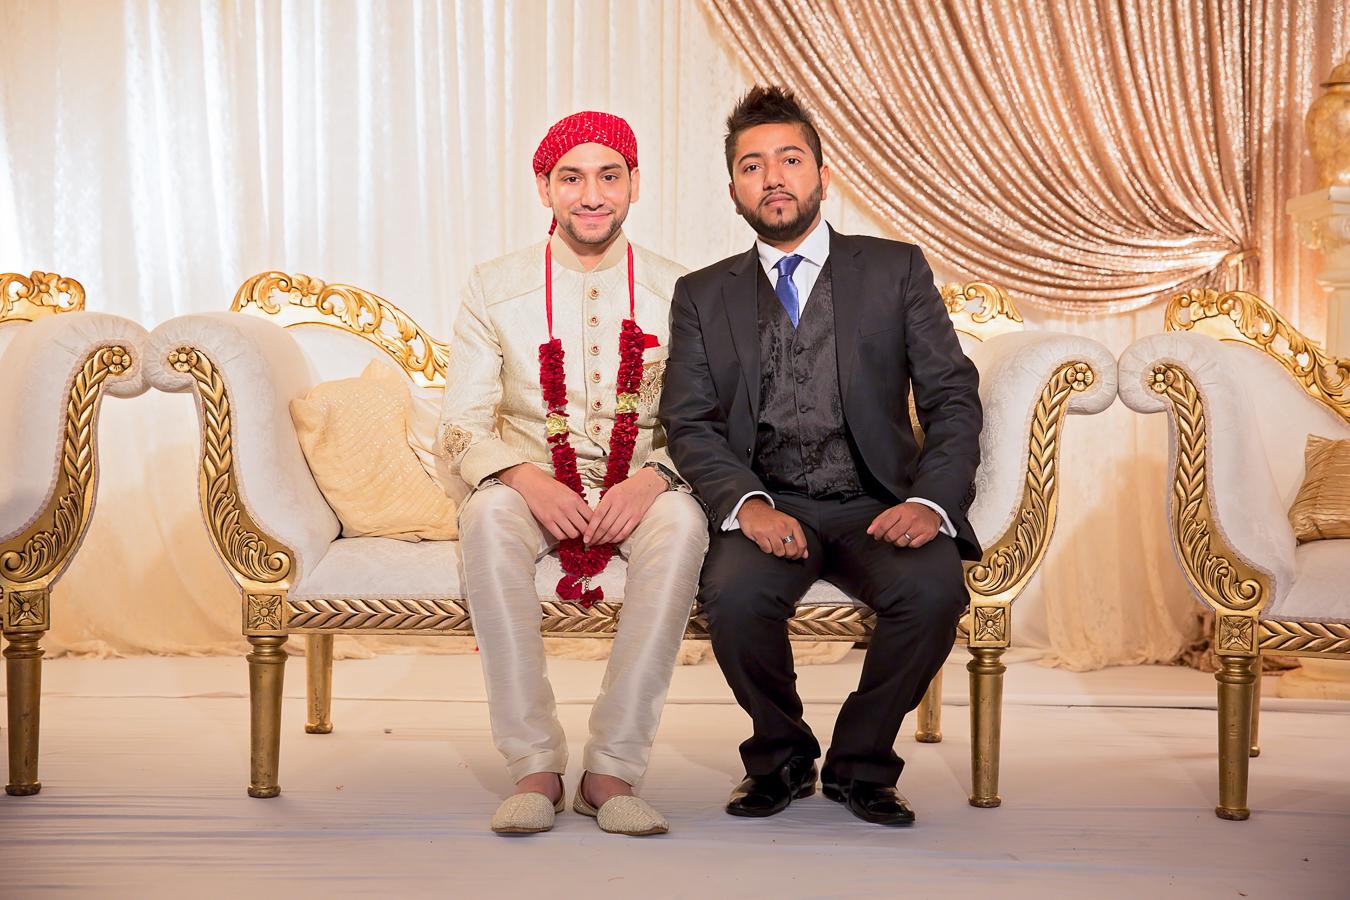 Nasir and Minara wedding at The Sheridan suite Macnchester Didsbury Opu Sultan Photography Manchester and Edinburgh Asian Muslim Hindu Sikh-65.jpg